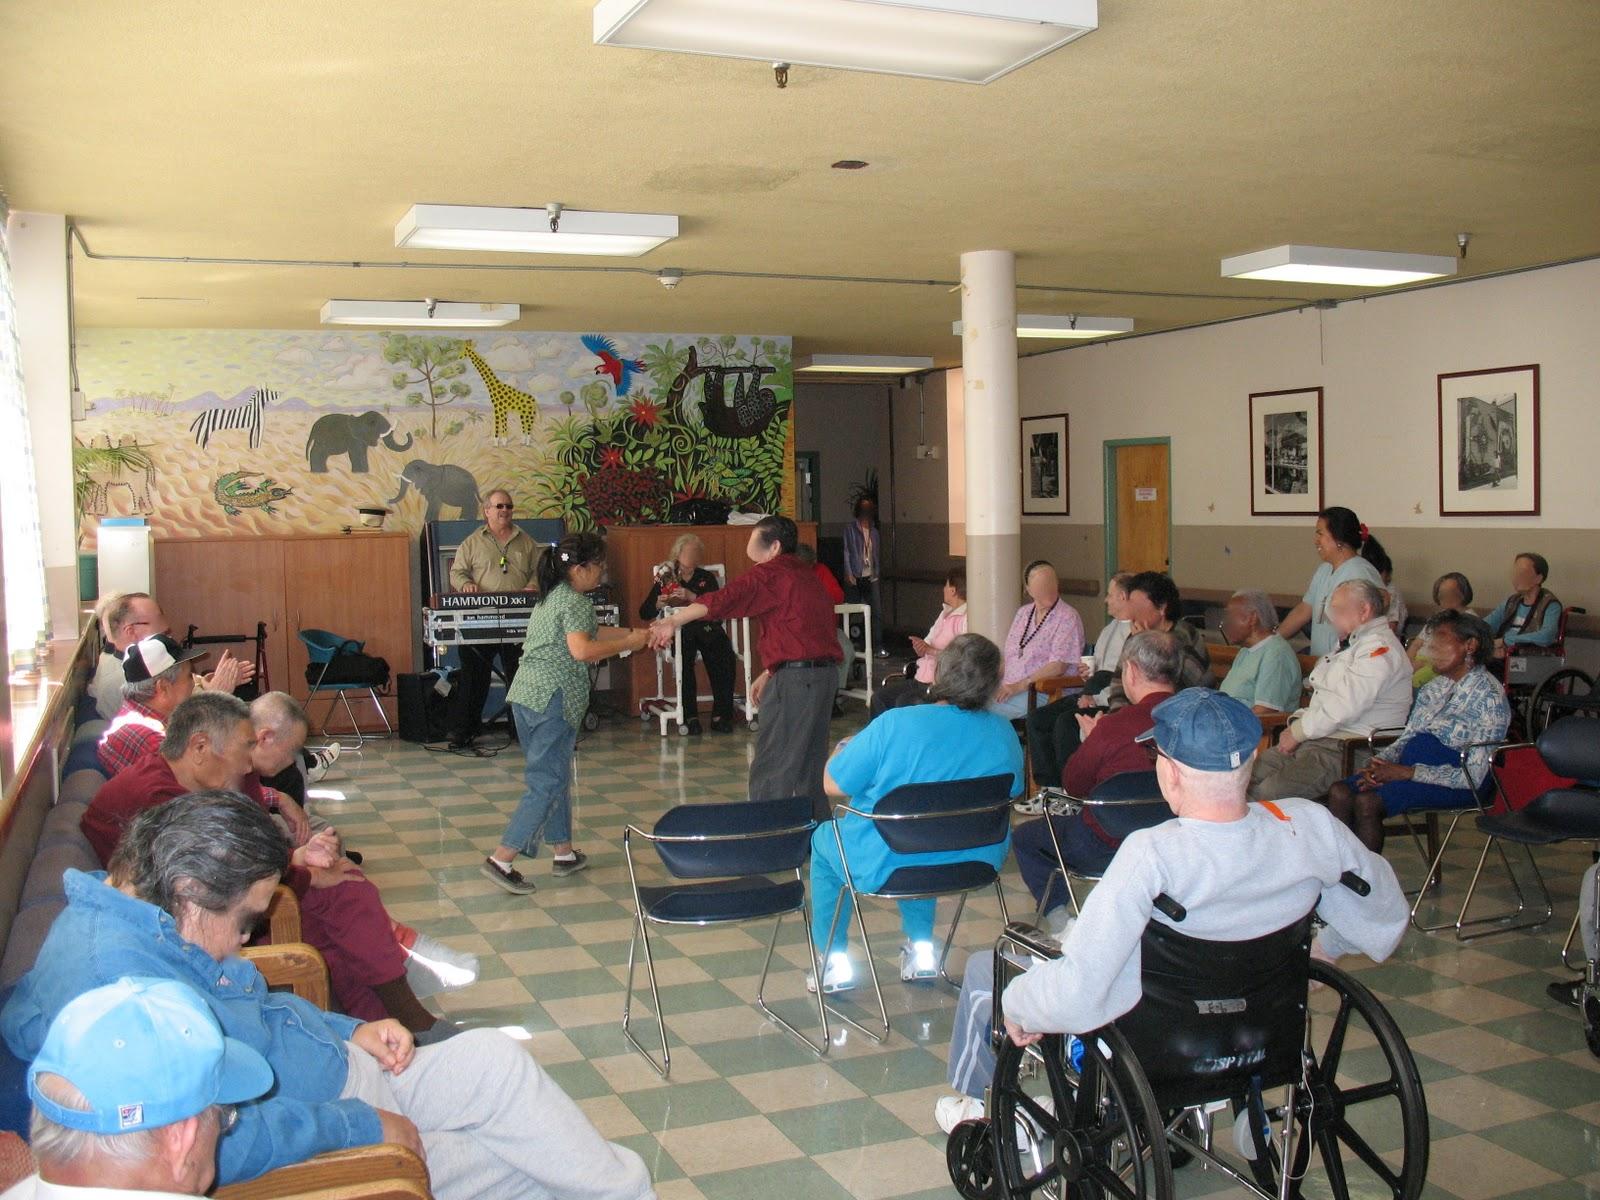 Move Day Laguna Honda Hospital Historic Event Volunteers and Staff